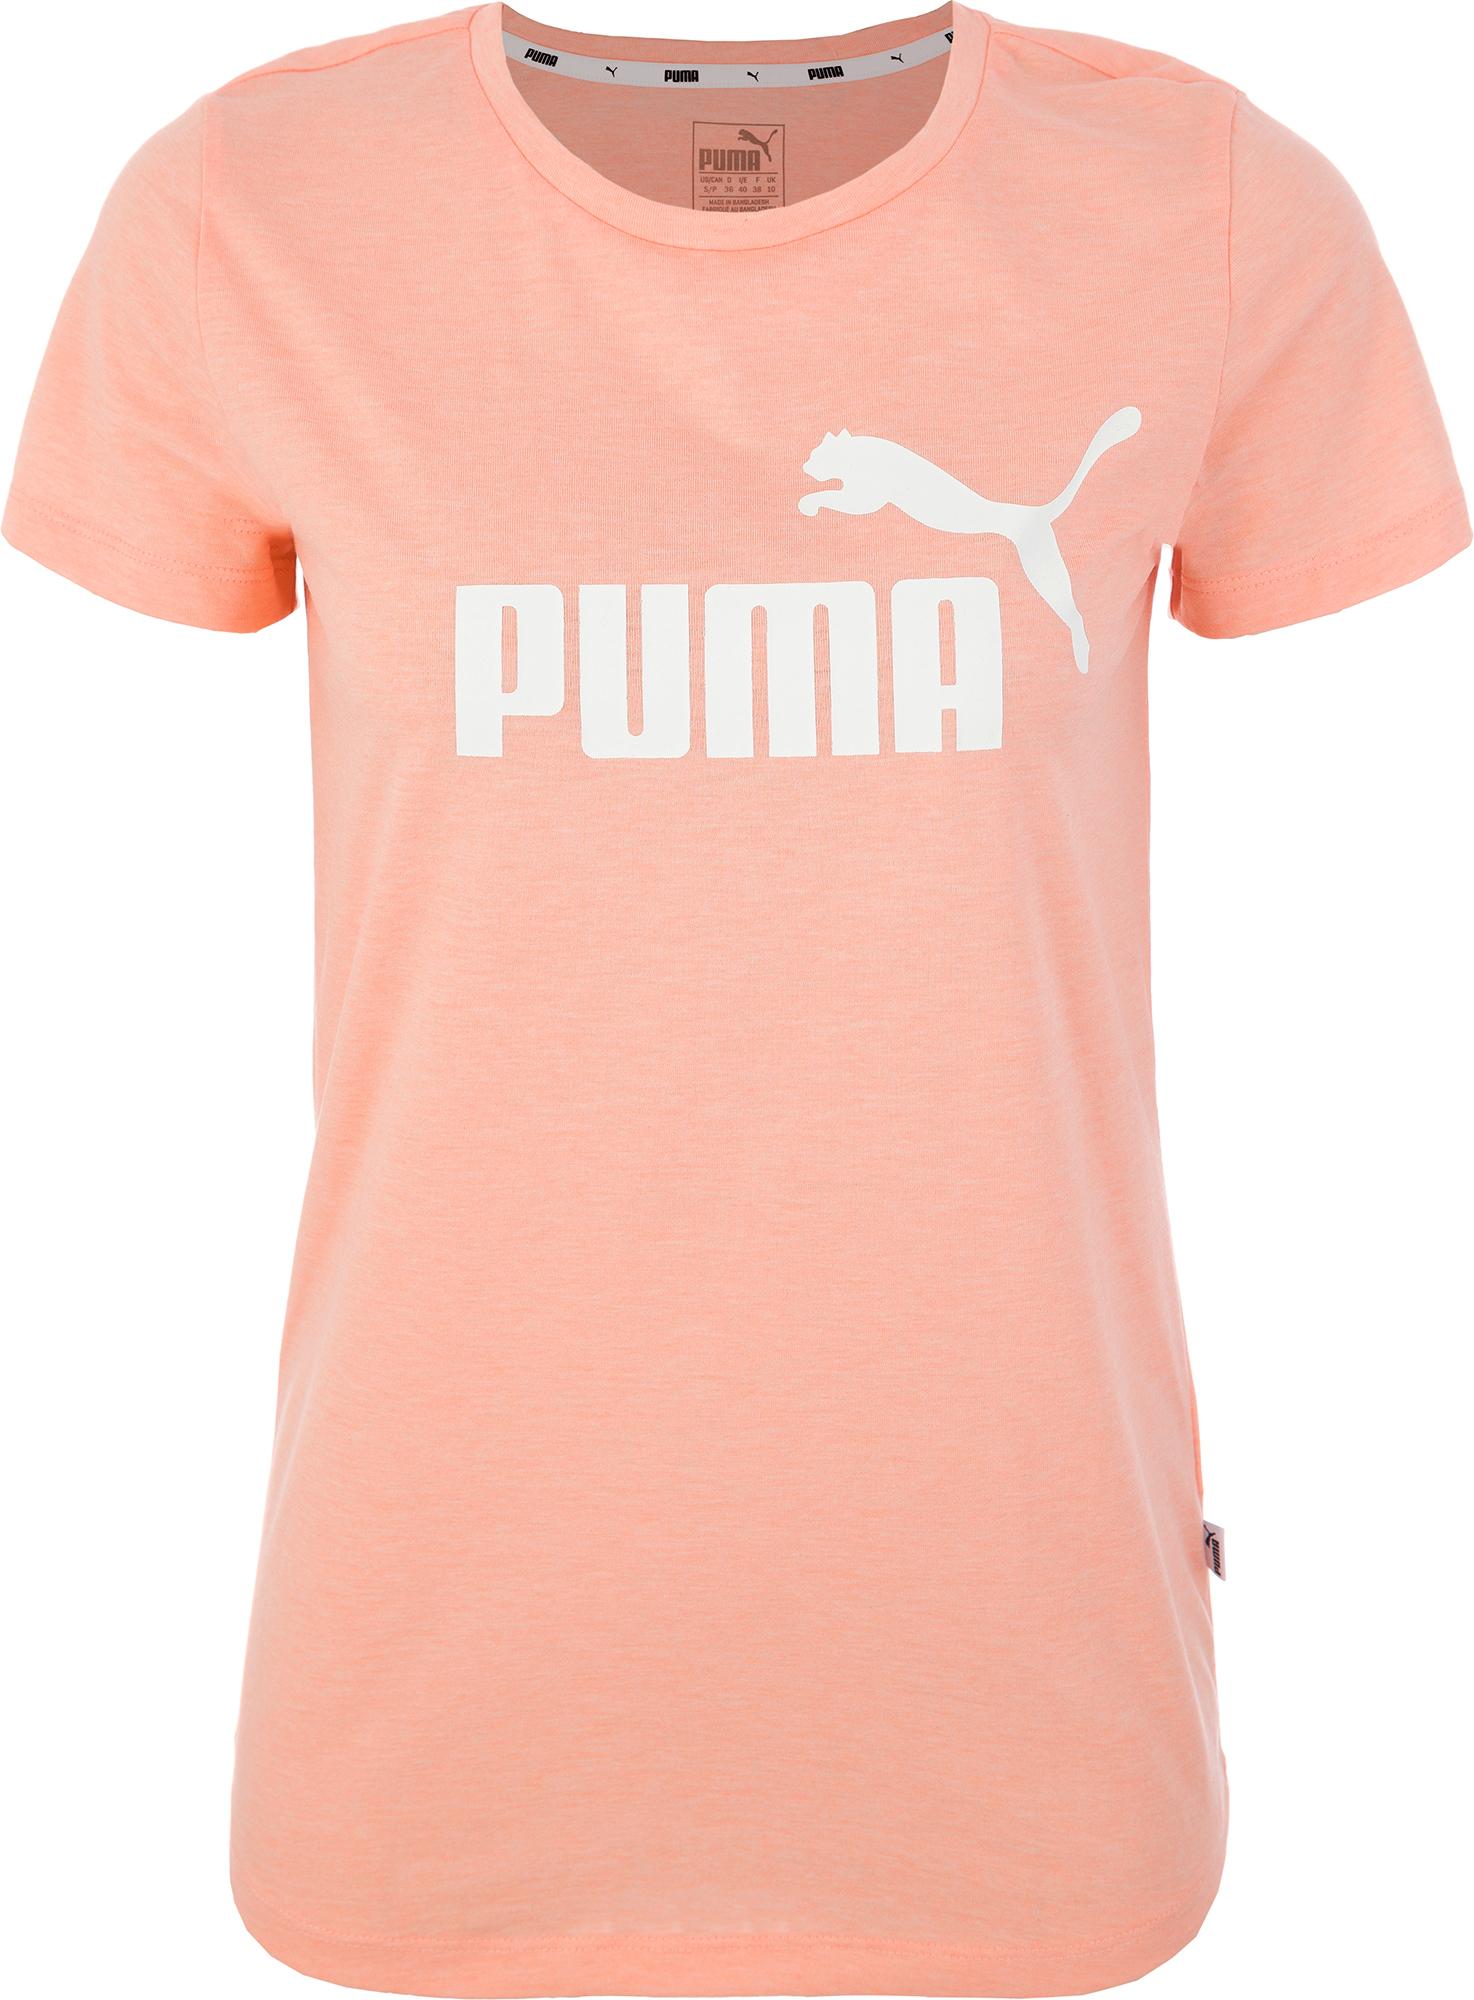 Puma Футболка женская Puma ESS+ Logo Heather Tee, размер 48-50 цена